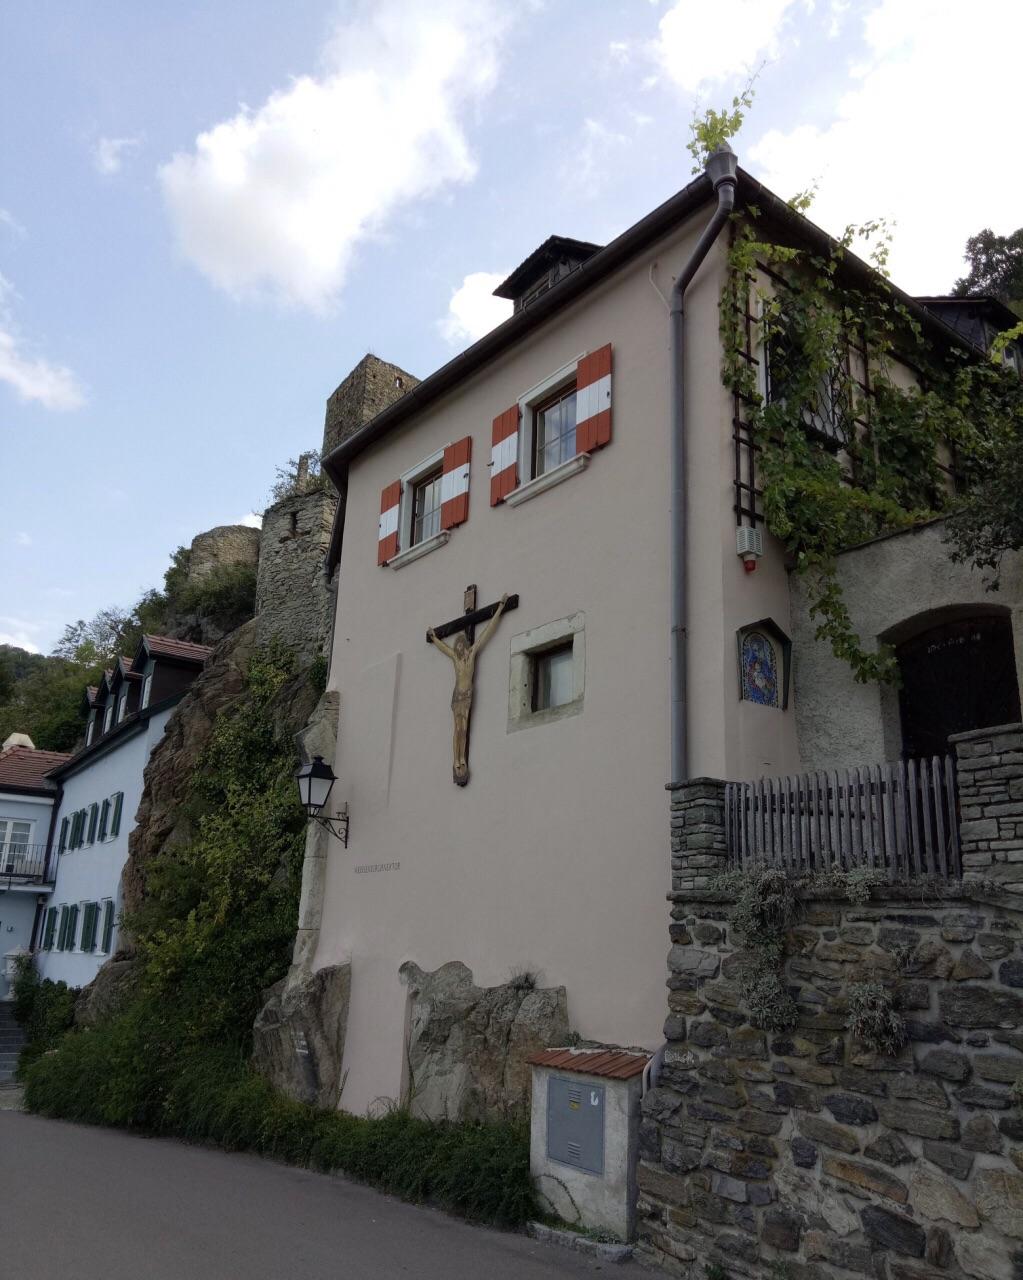 The Wachau Valley Winery